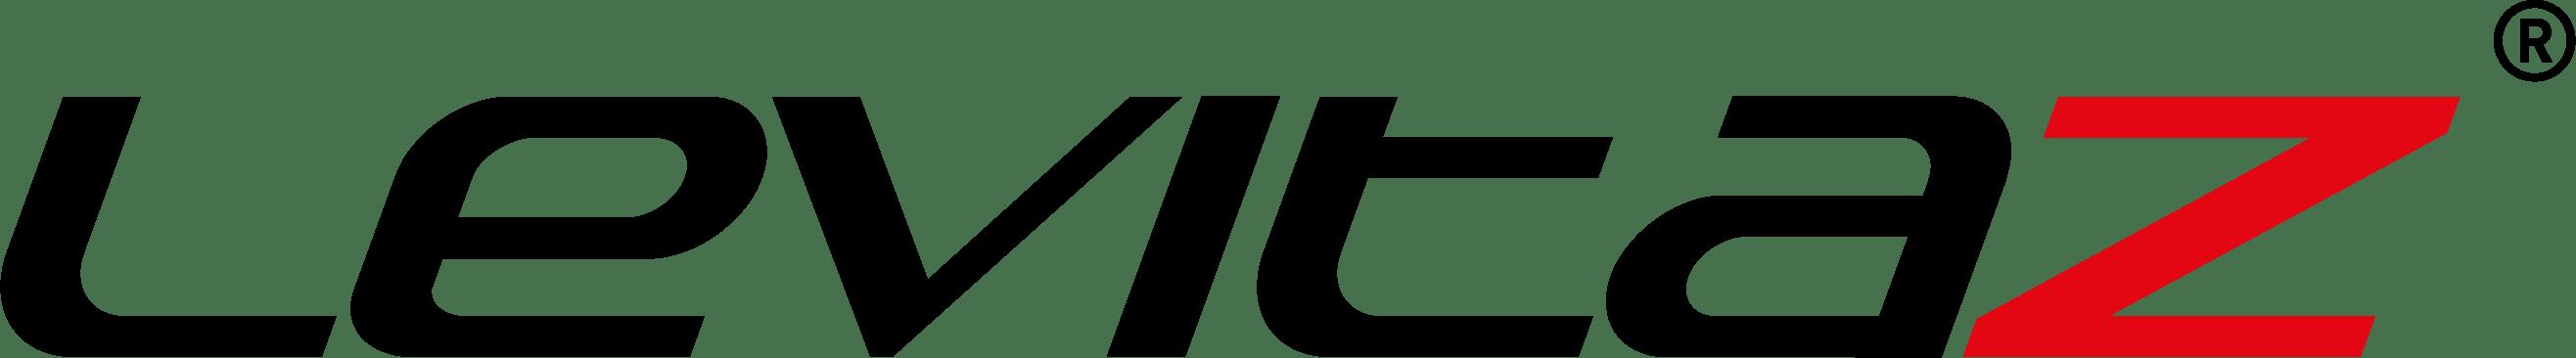 Levitaz-Logo_Black